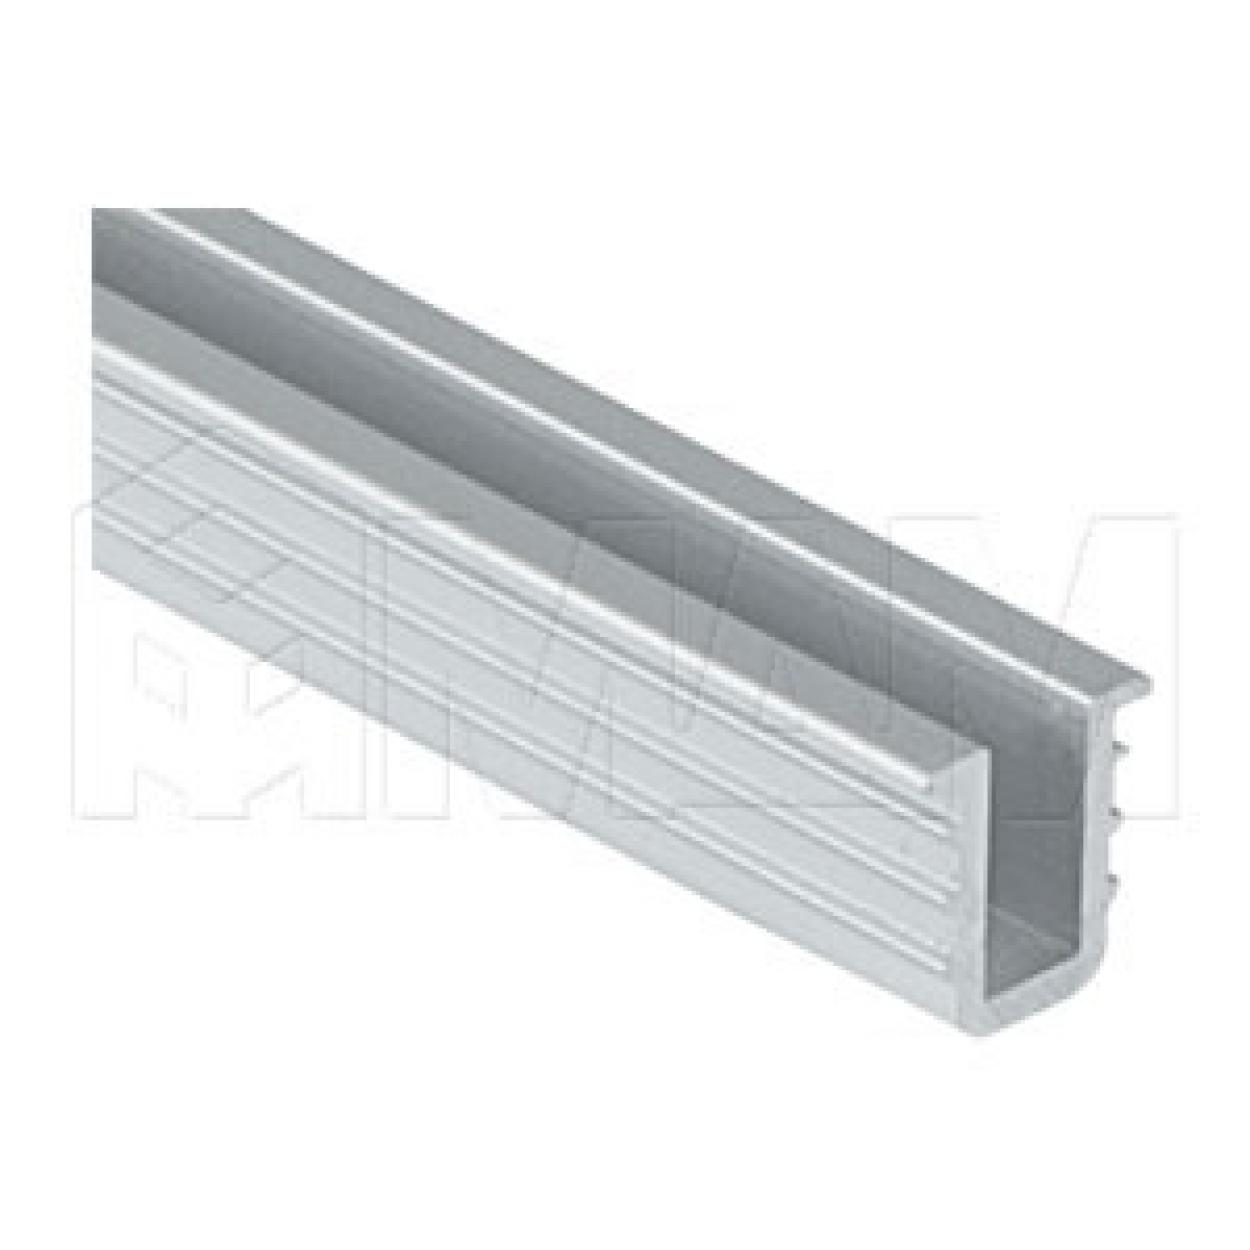 MiniCabinet Направляющая верхняя, серебро, L-5500